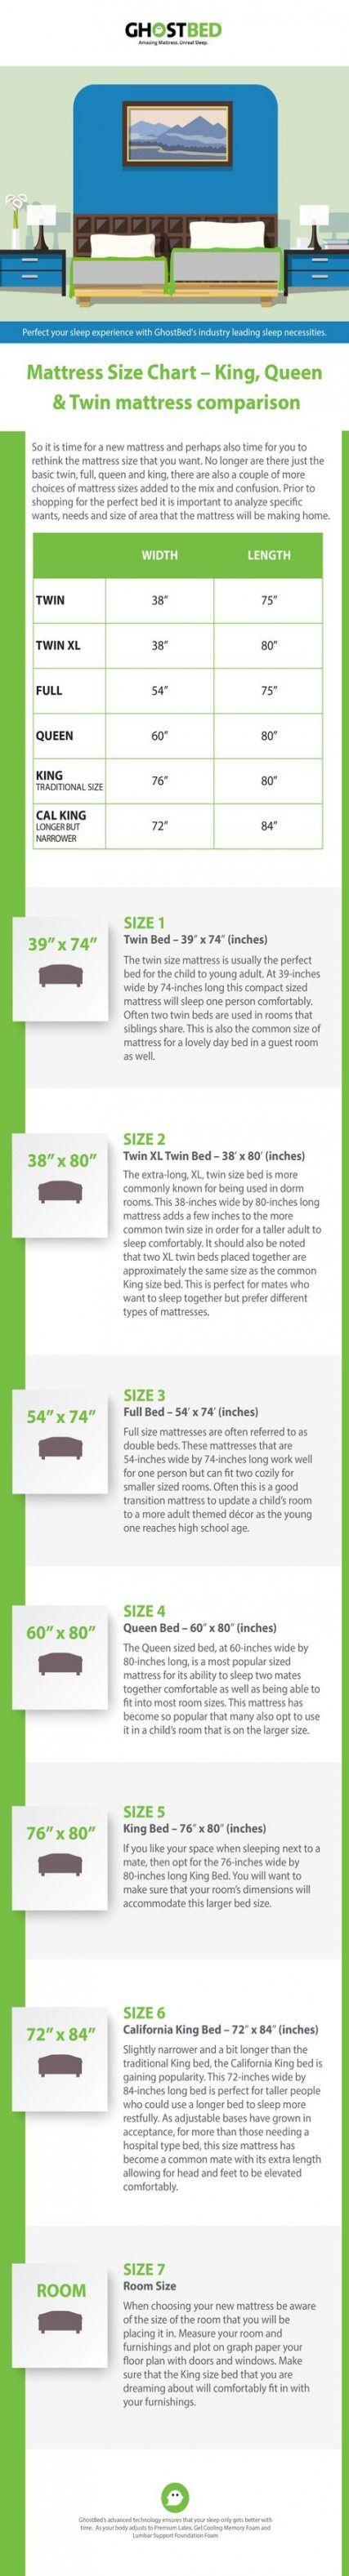 Bedroom Ideas For Women Green Living Rooms 46 Ideas